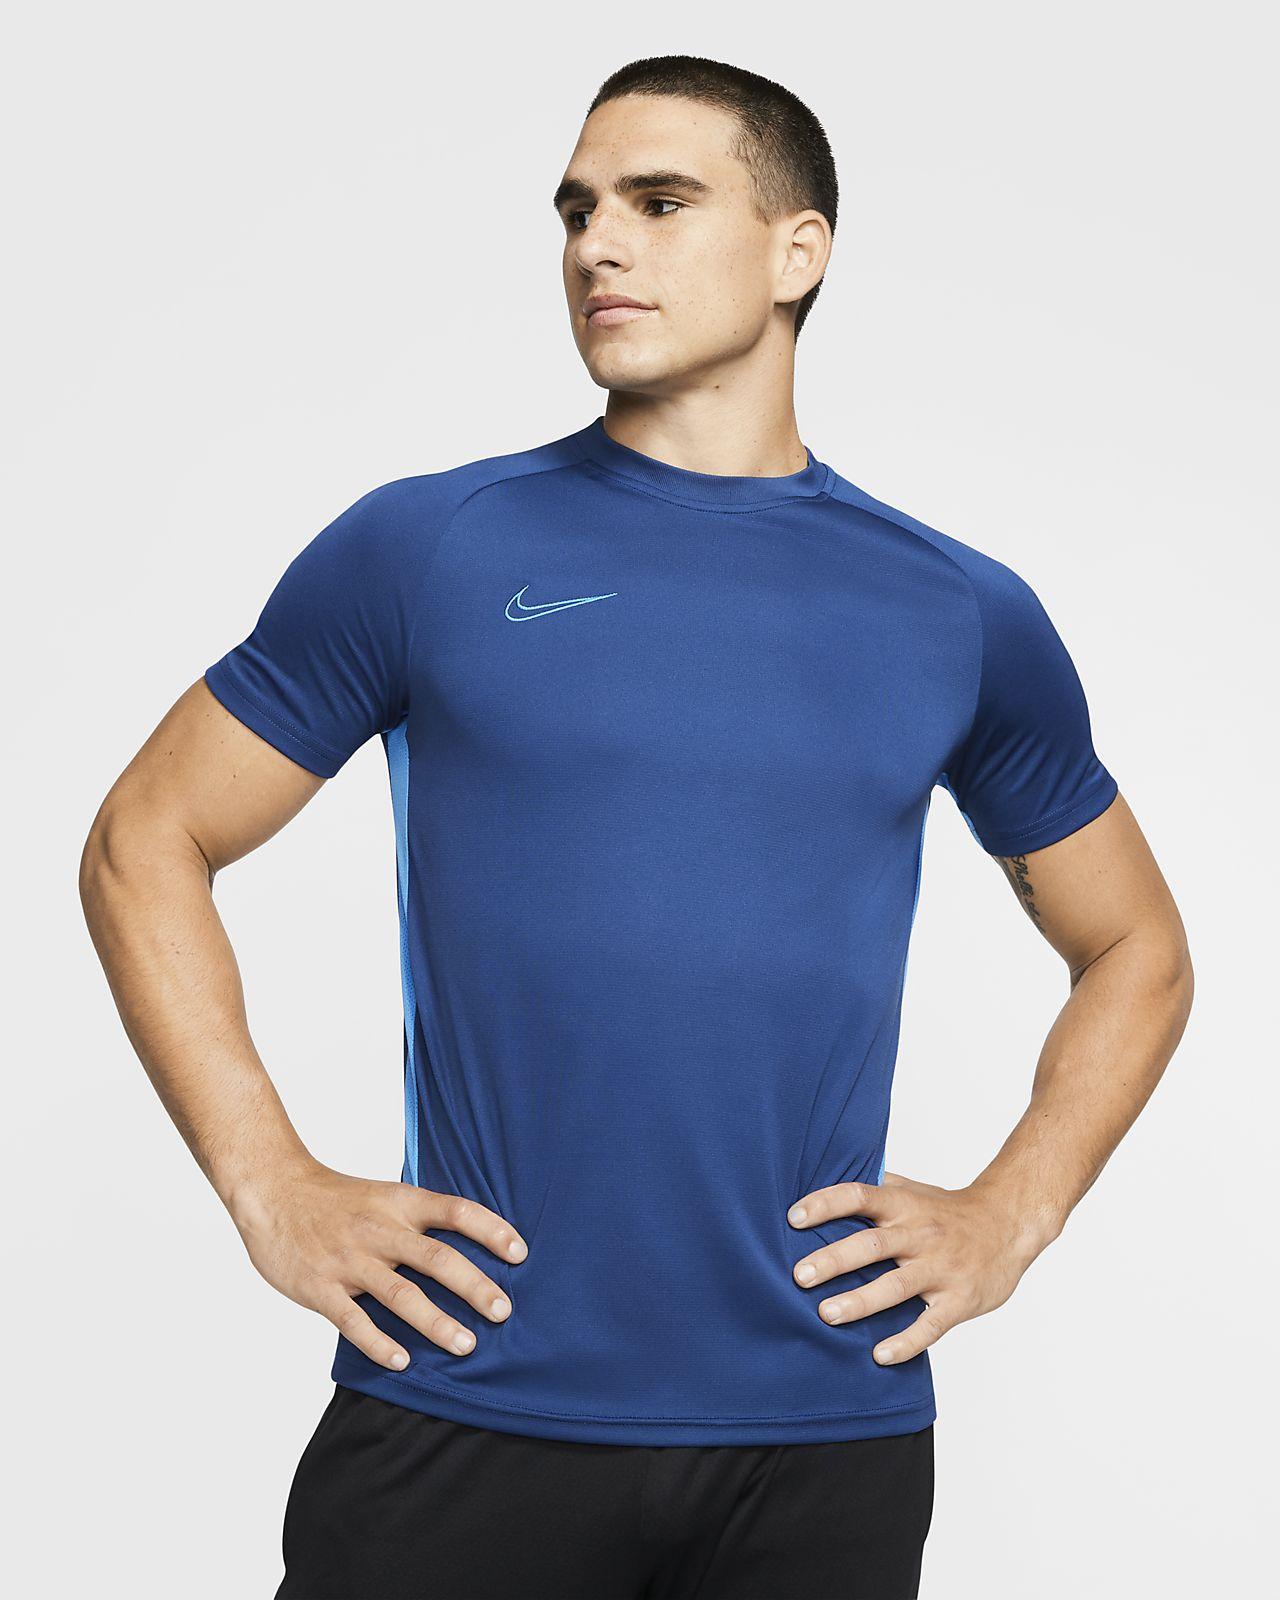 Prenda superior de fútbol de manga corta para hombre Nike Dri-FIT Academy